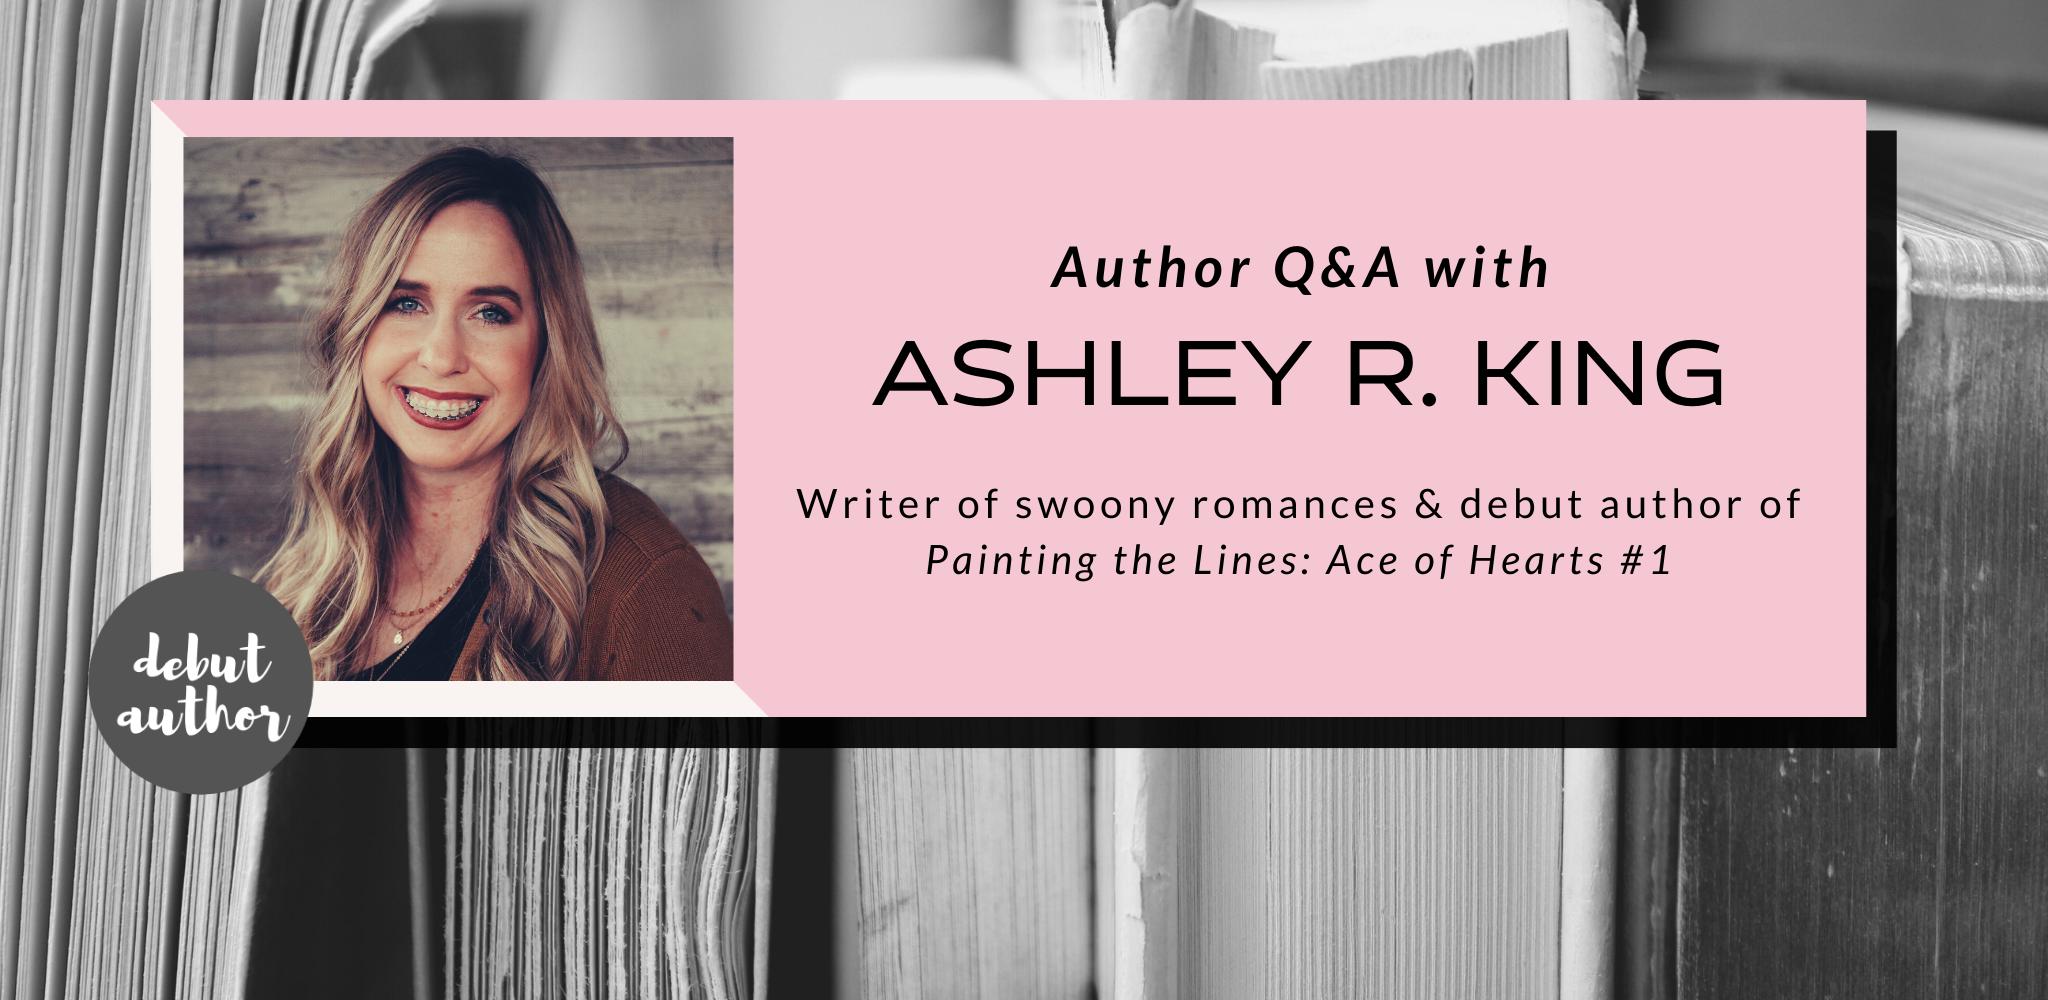 Q&A with Ashley R. King